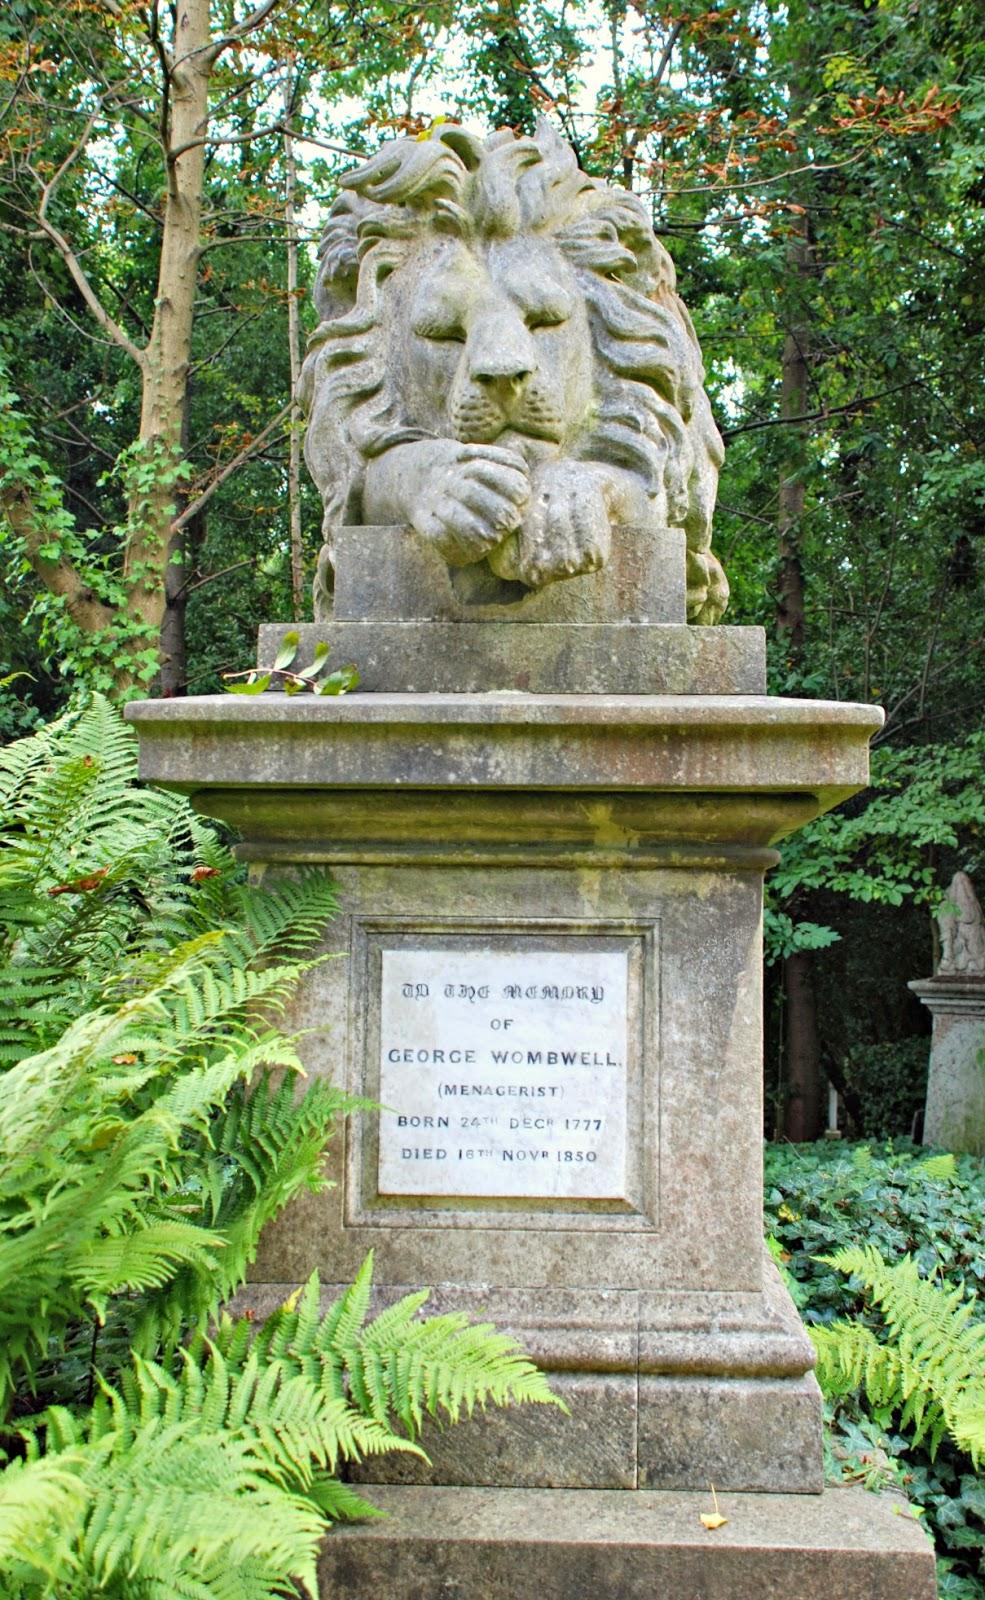 George Wombwells' memorial, Highgate Cemetery, London